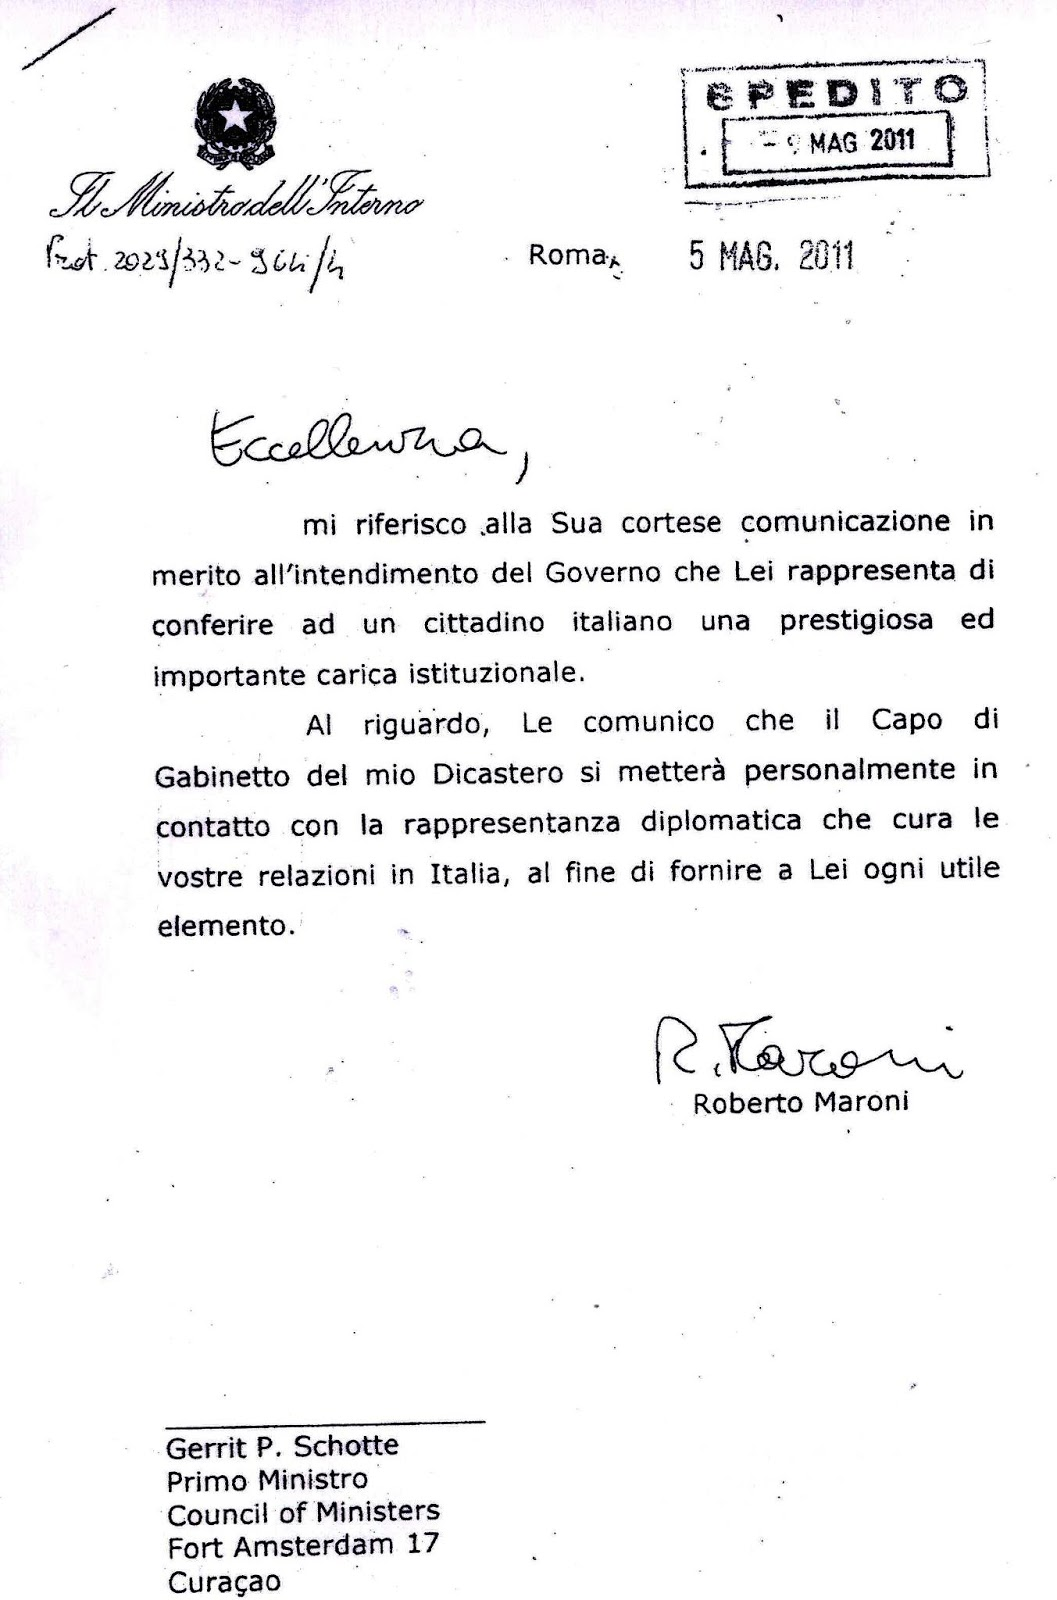 voorbeeldbrief toestemming Ata Palabra: oktober 2012 voorbeeldbrief toestemming